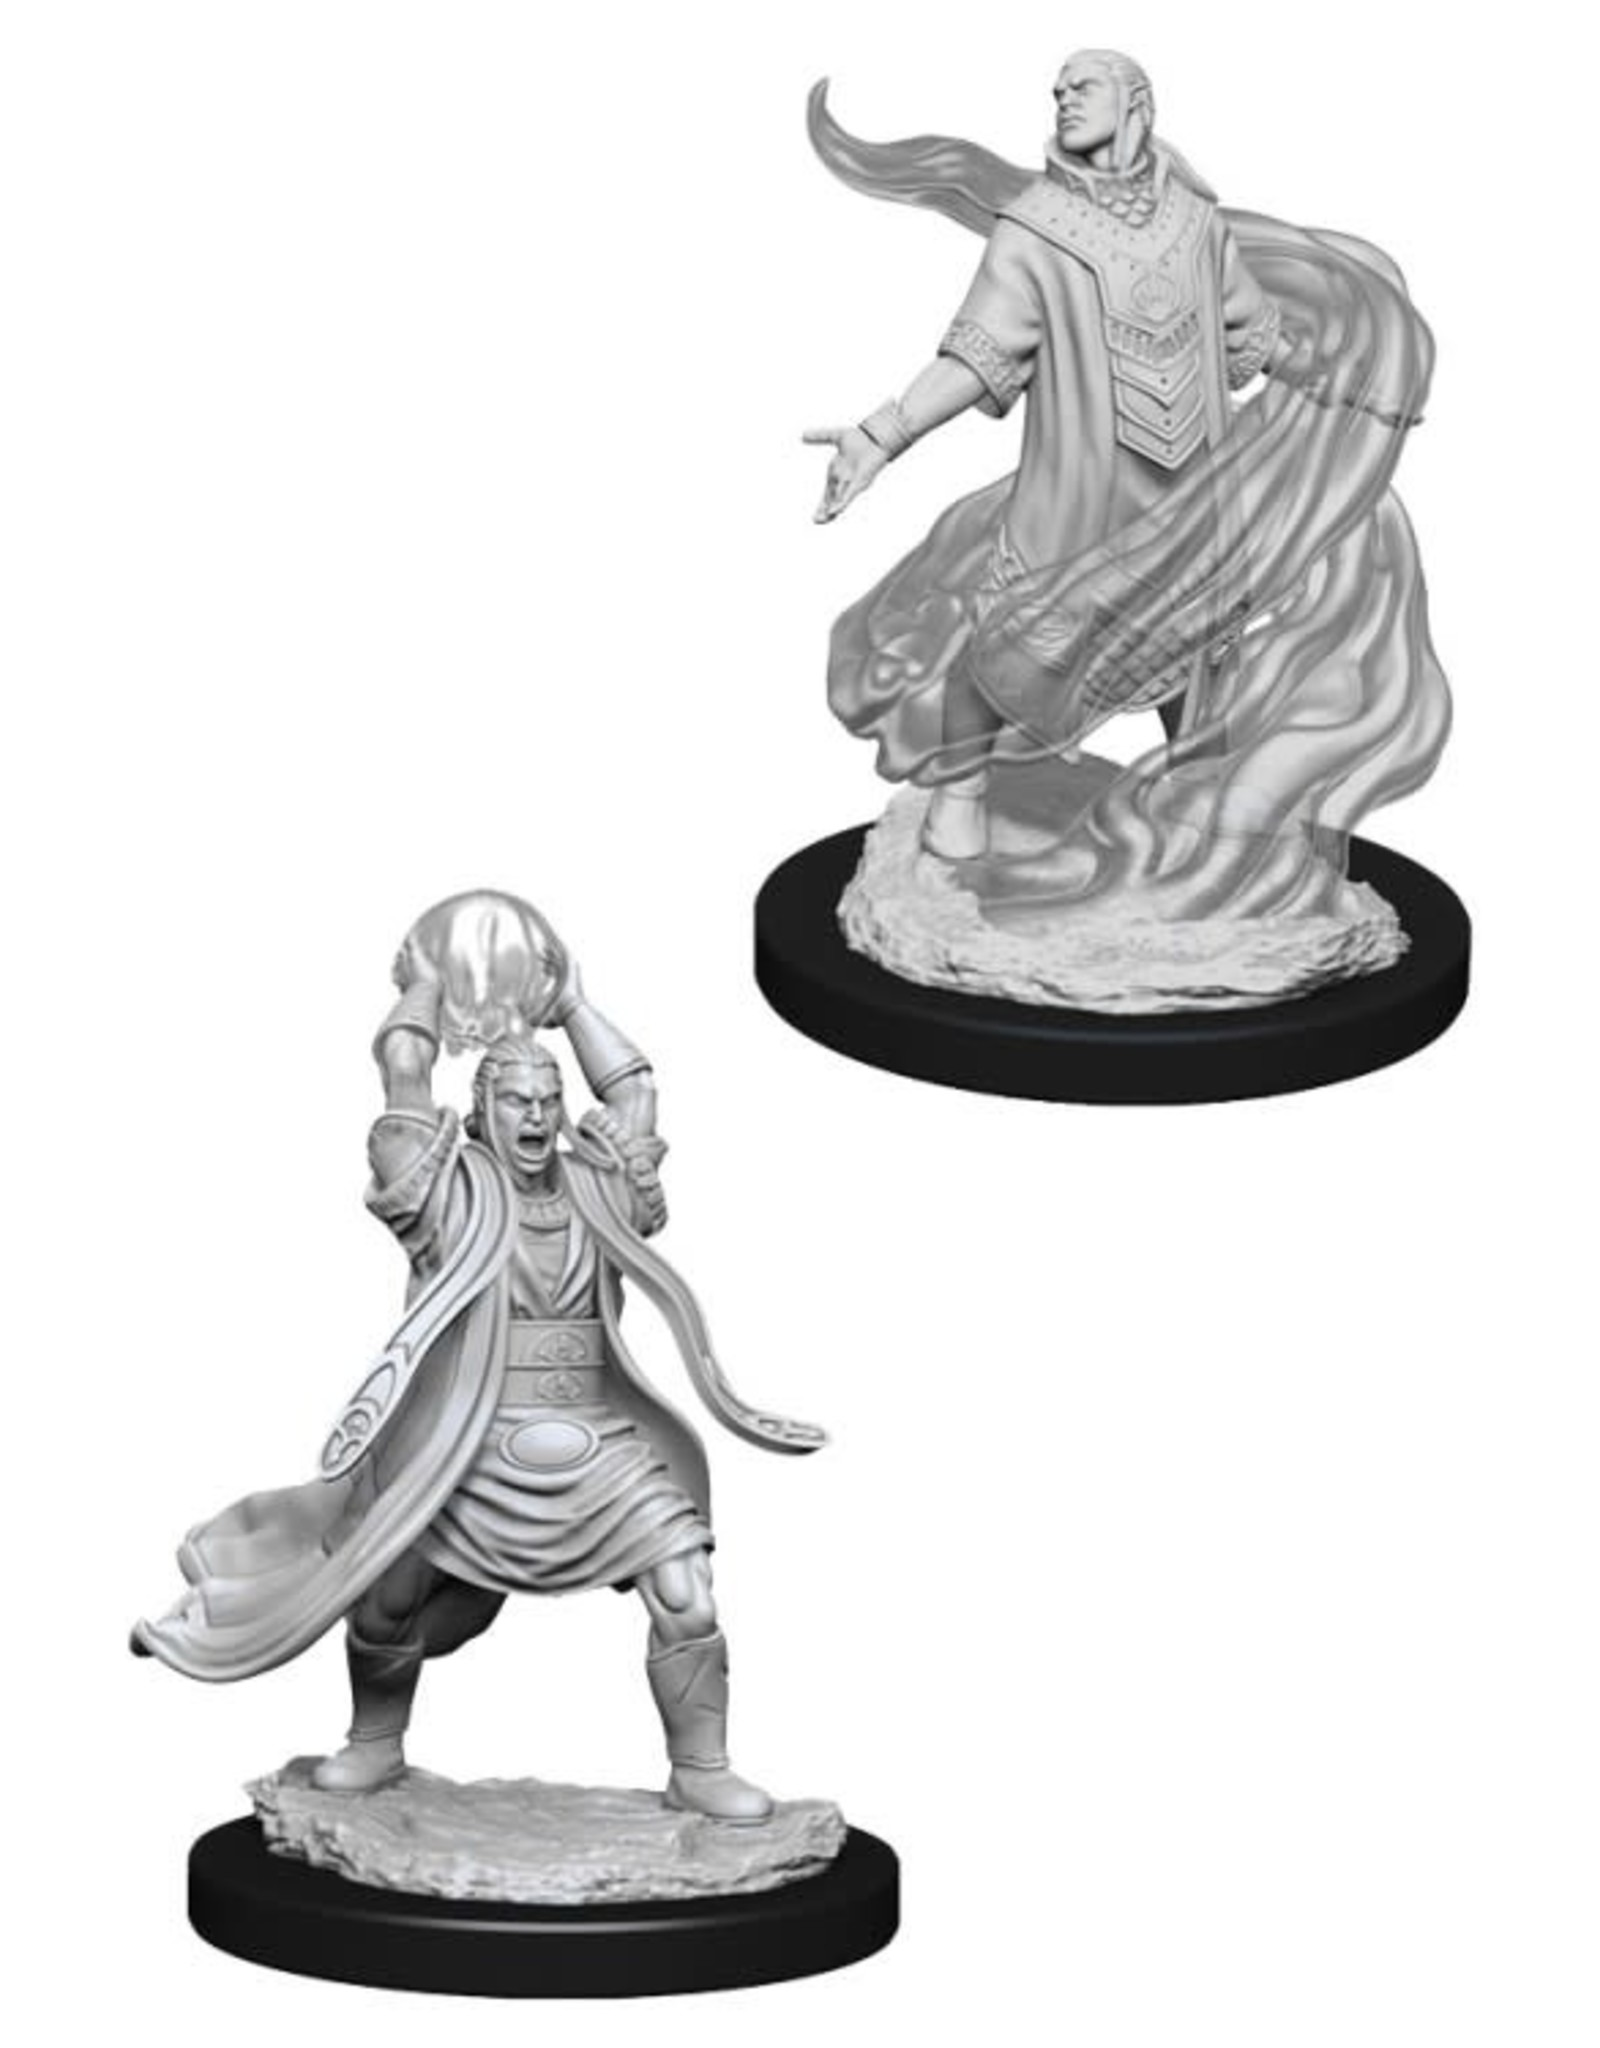 WizKids D&D Nolzur Elf Sorcerer  (He/Him/They/Them) (W11)